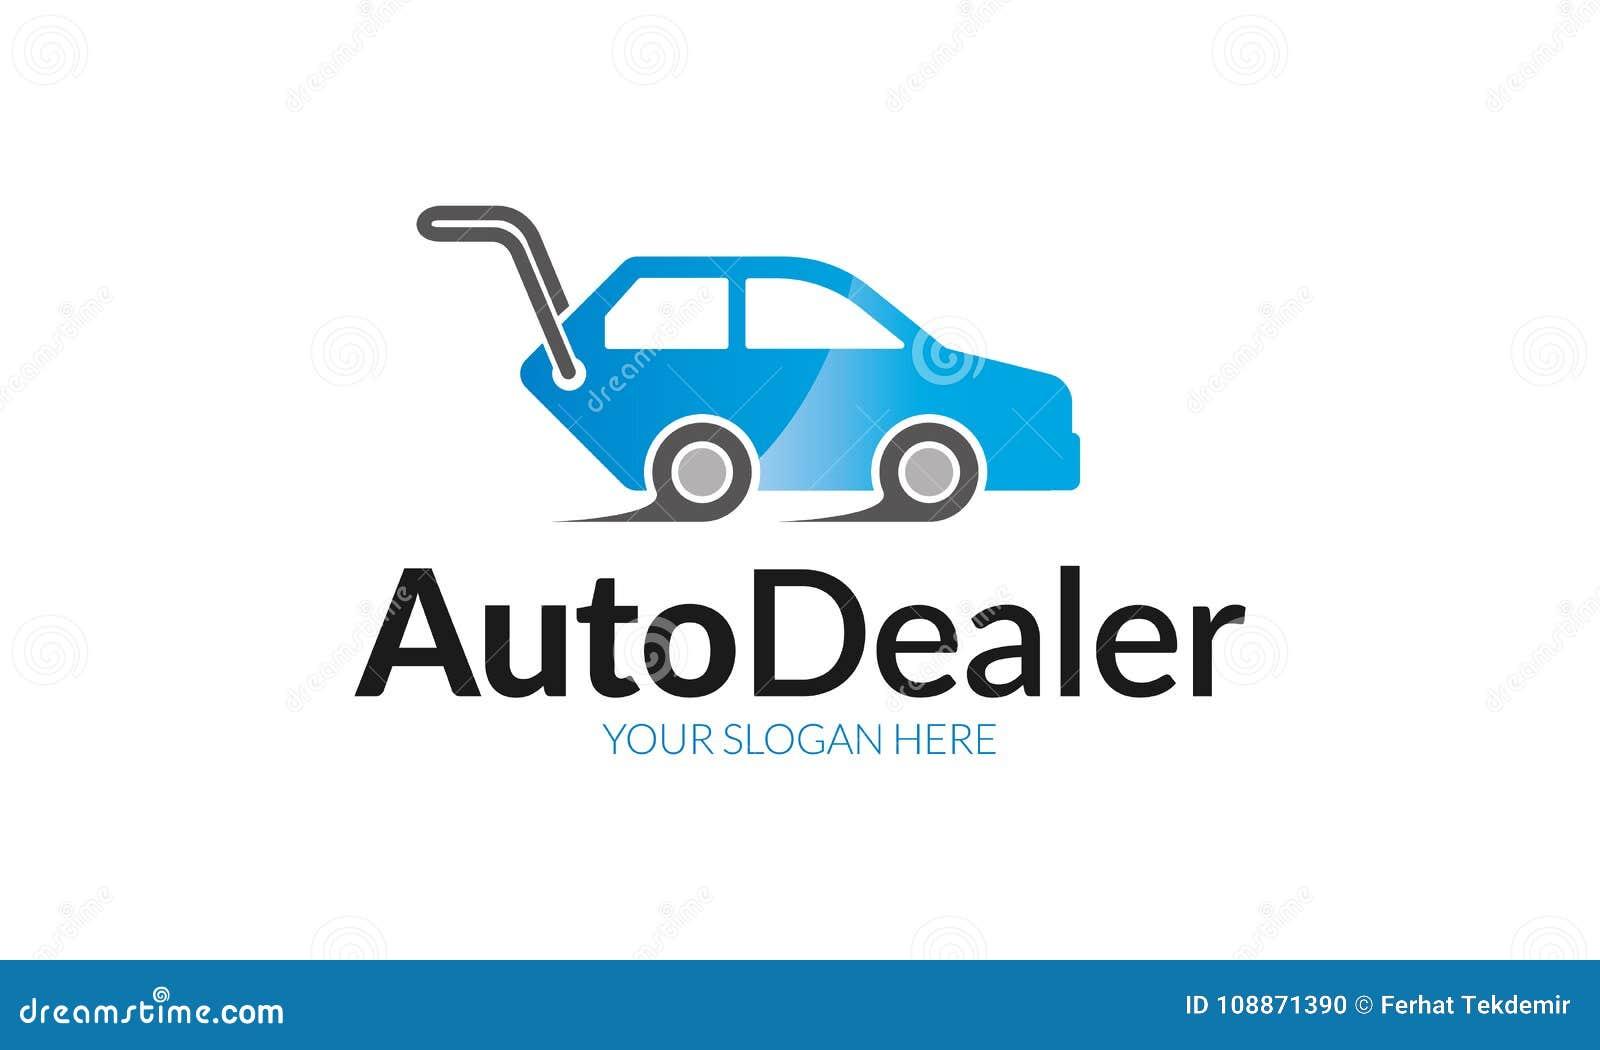 Auto Dealer Logo Template Stock Vector Illustration Of Logo 108871390